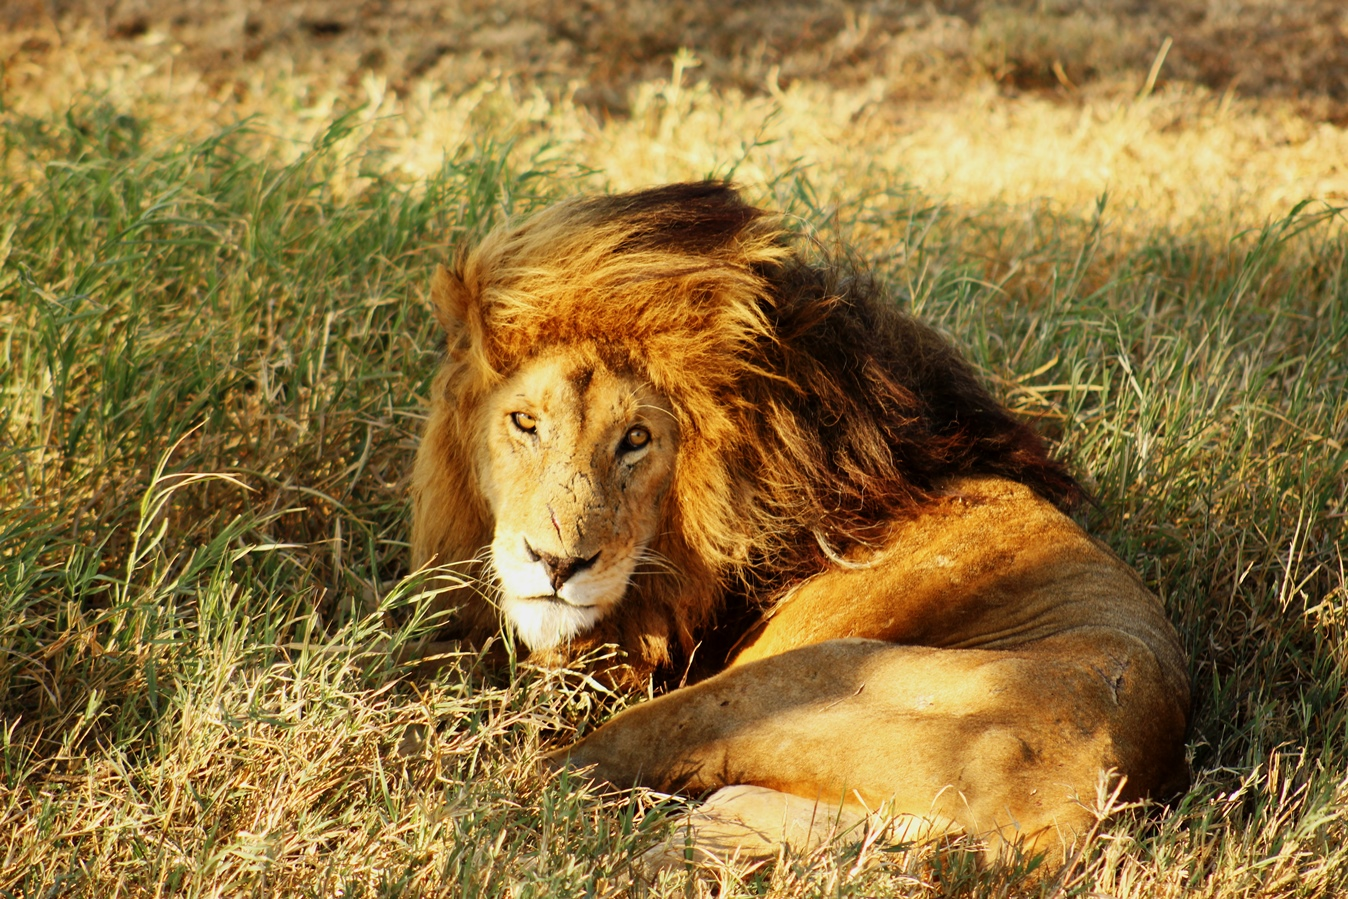 Sababu_Safaris_lion.JPG